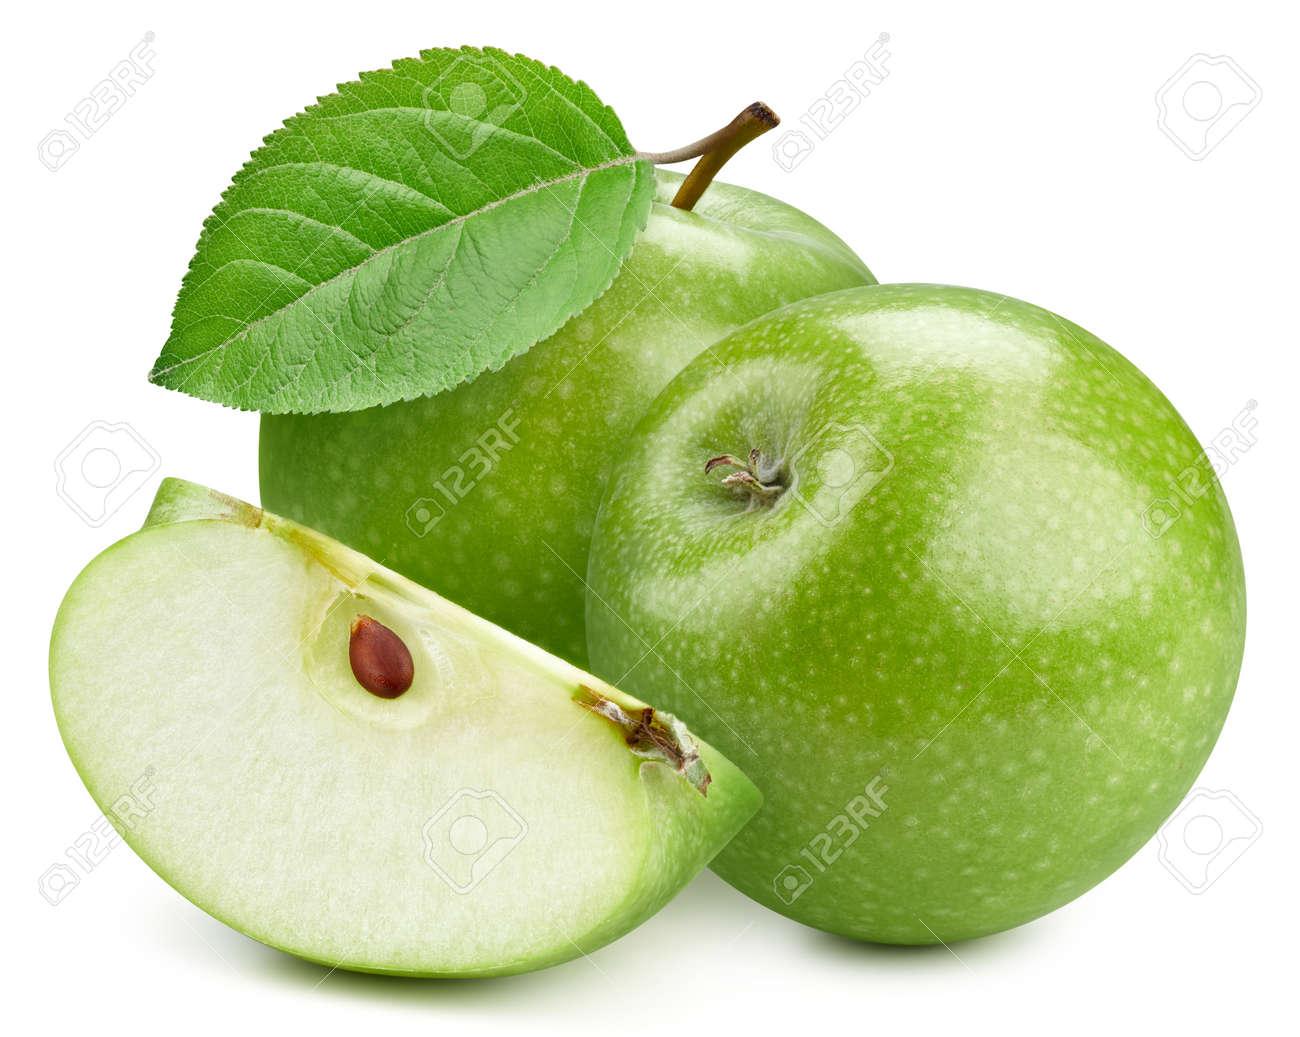 Fresh organic green apple isolated on white background. - 158338498